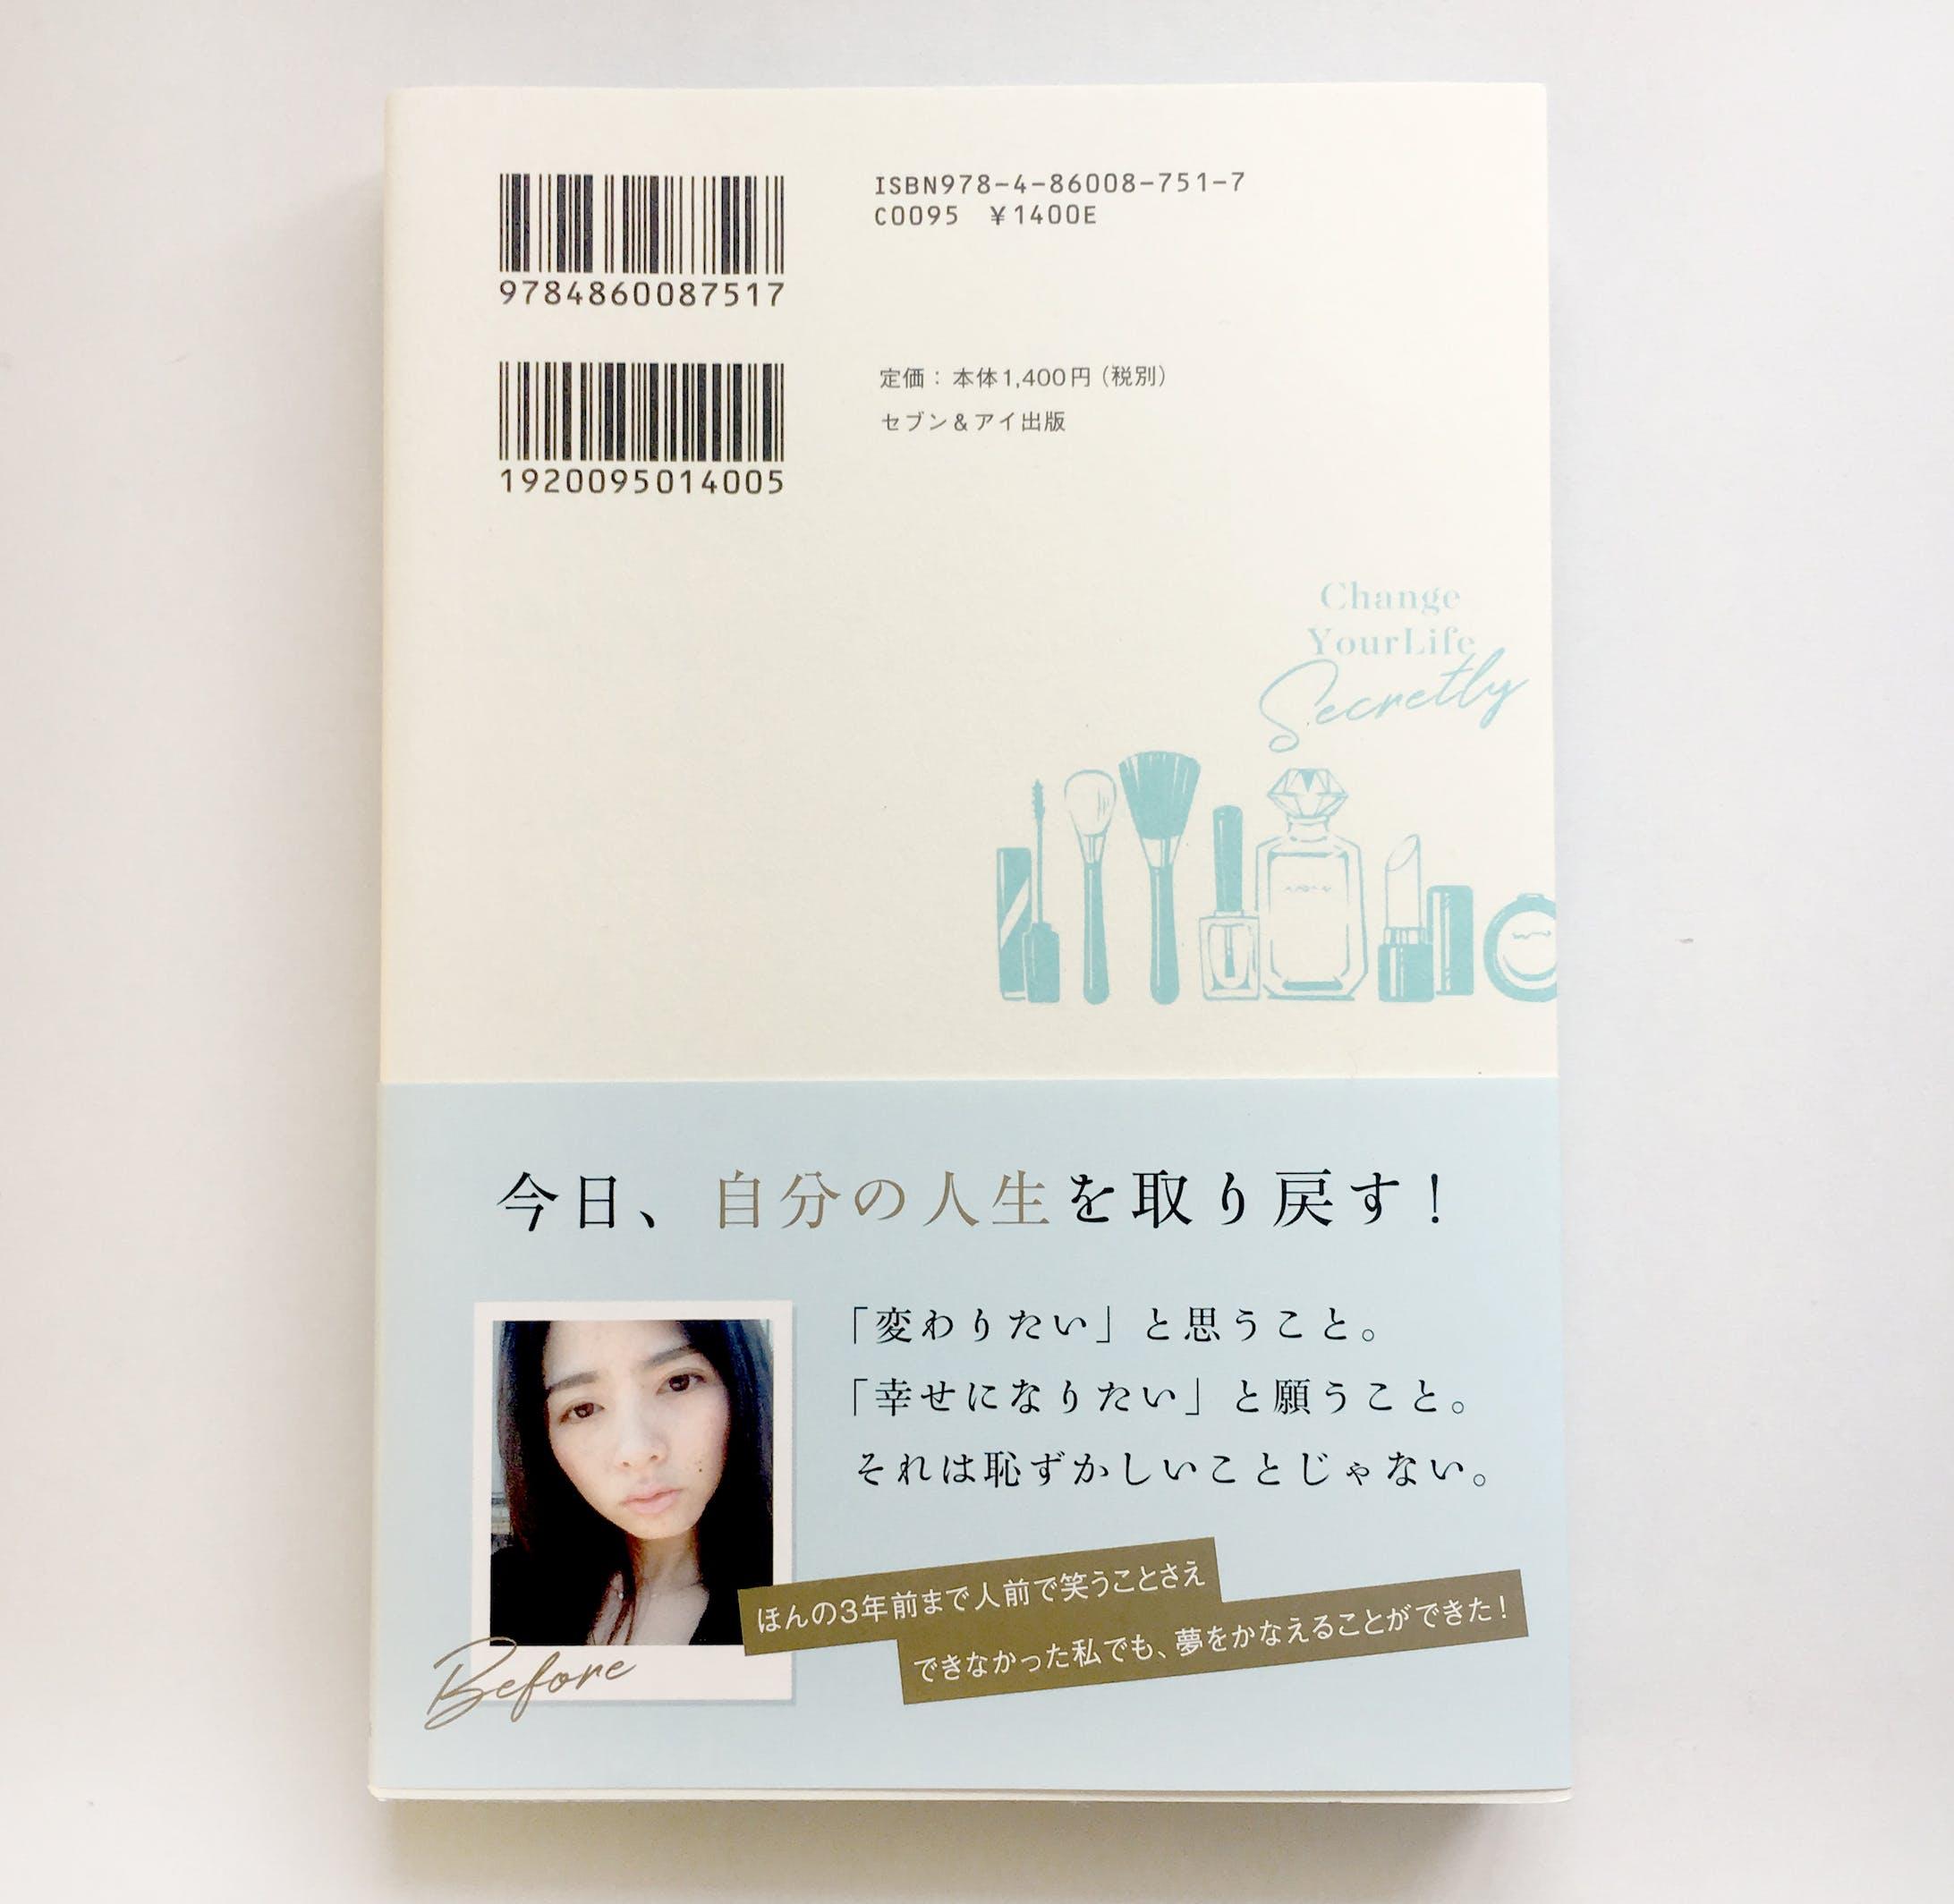 【WORK】装画 「運命をこっそり変える」/ セブン&アイ出版-3